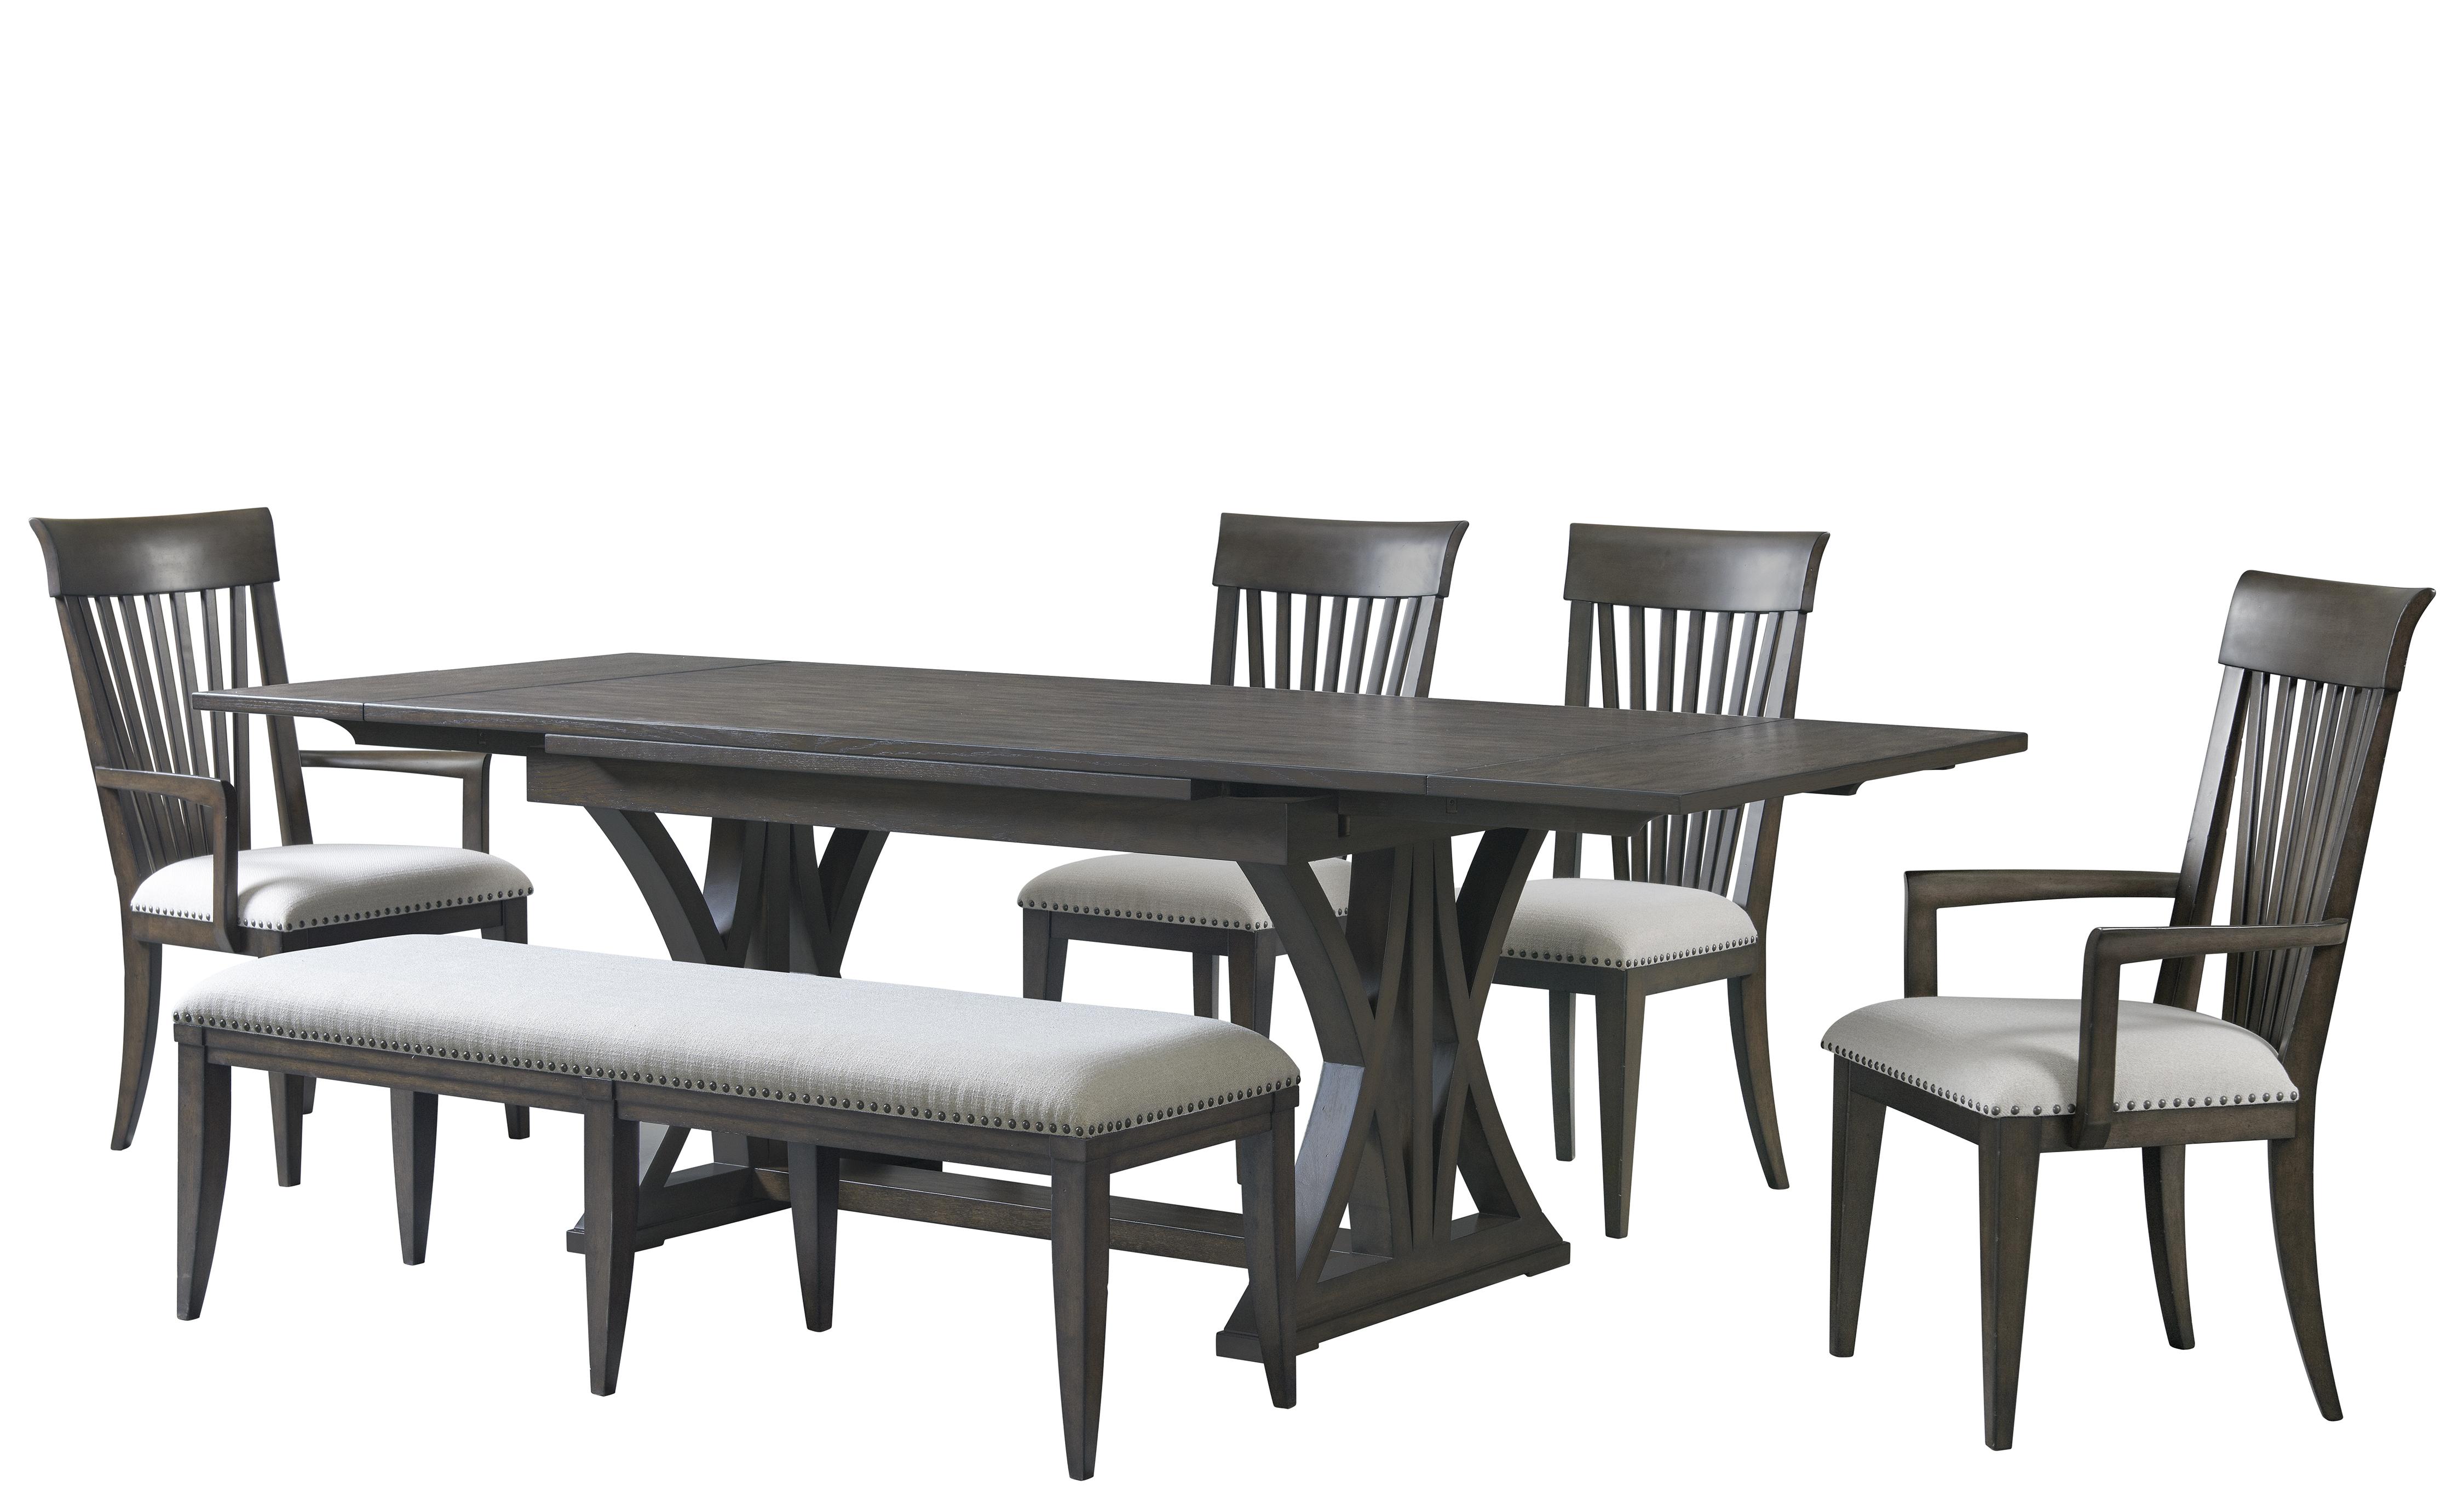 Forsyth 6-Piece Dining Set by Riverside Furniture at Prime Brothers Furniture